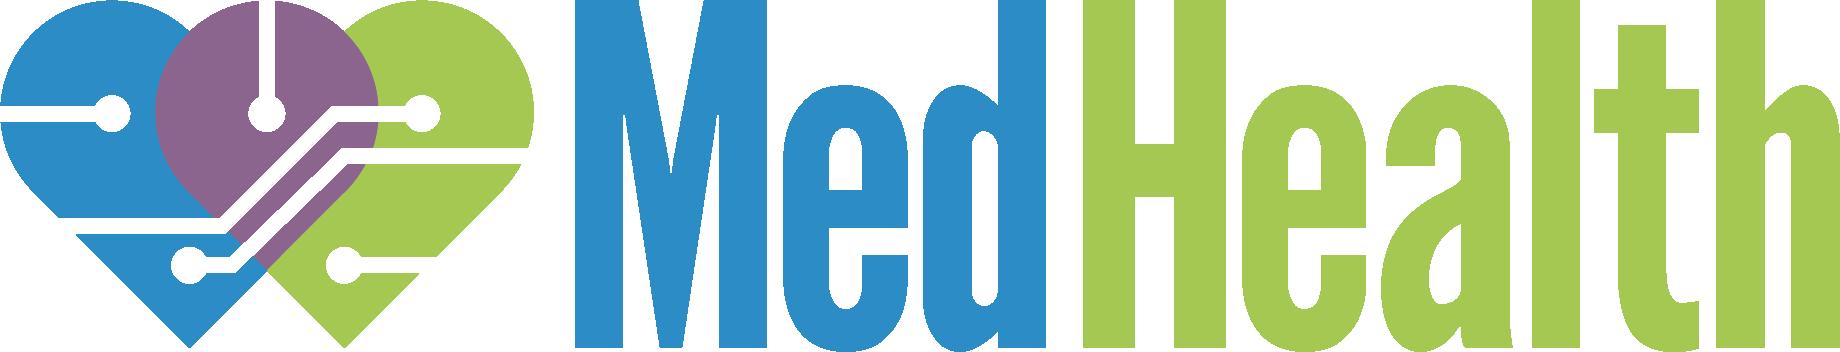 MedHealth-logo.png